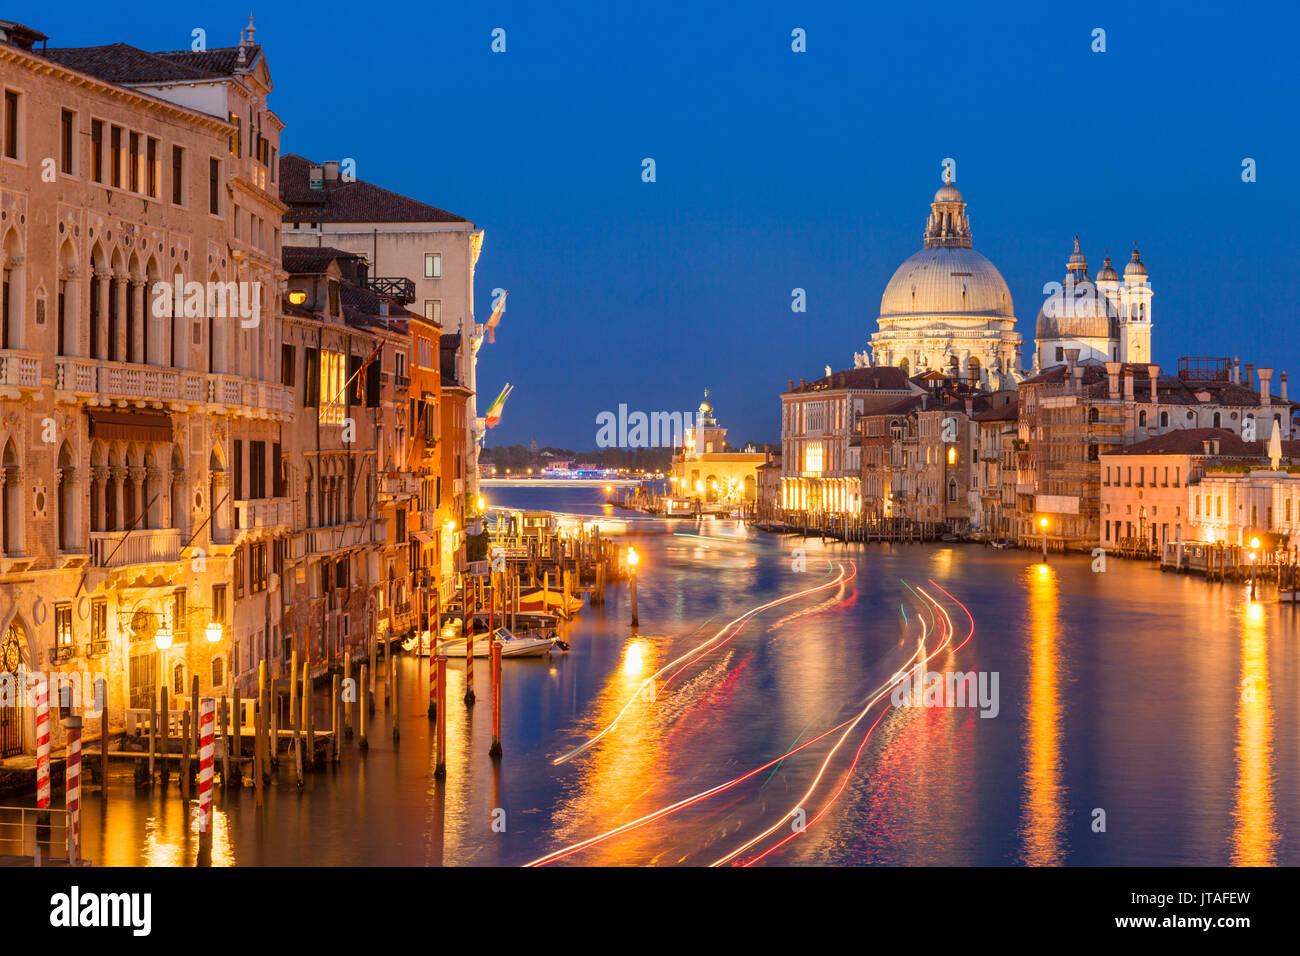 Grand Canal, and the church of Santa Maria della Salute, at night, with boat light trails, Venice, UNESCO, Veneto, Italy, Europe - Stock Image